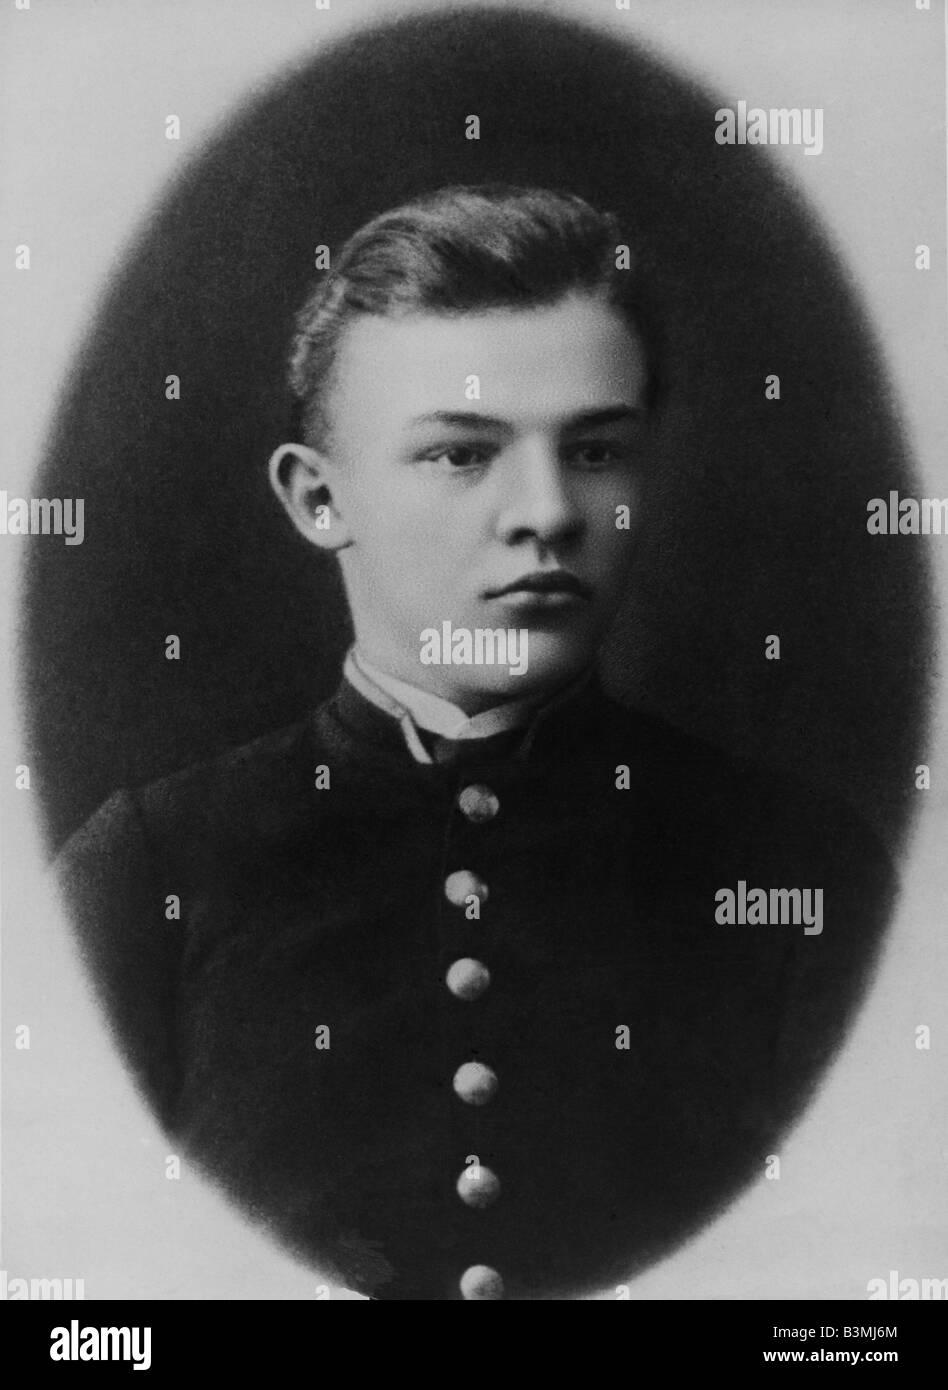 VLADIMIR LENIN Russian revolutionary about 1888 - Stock Image